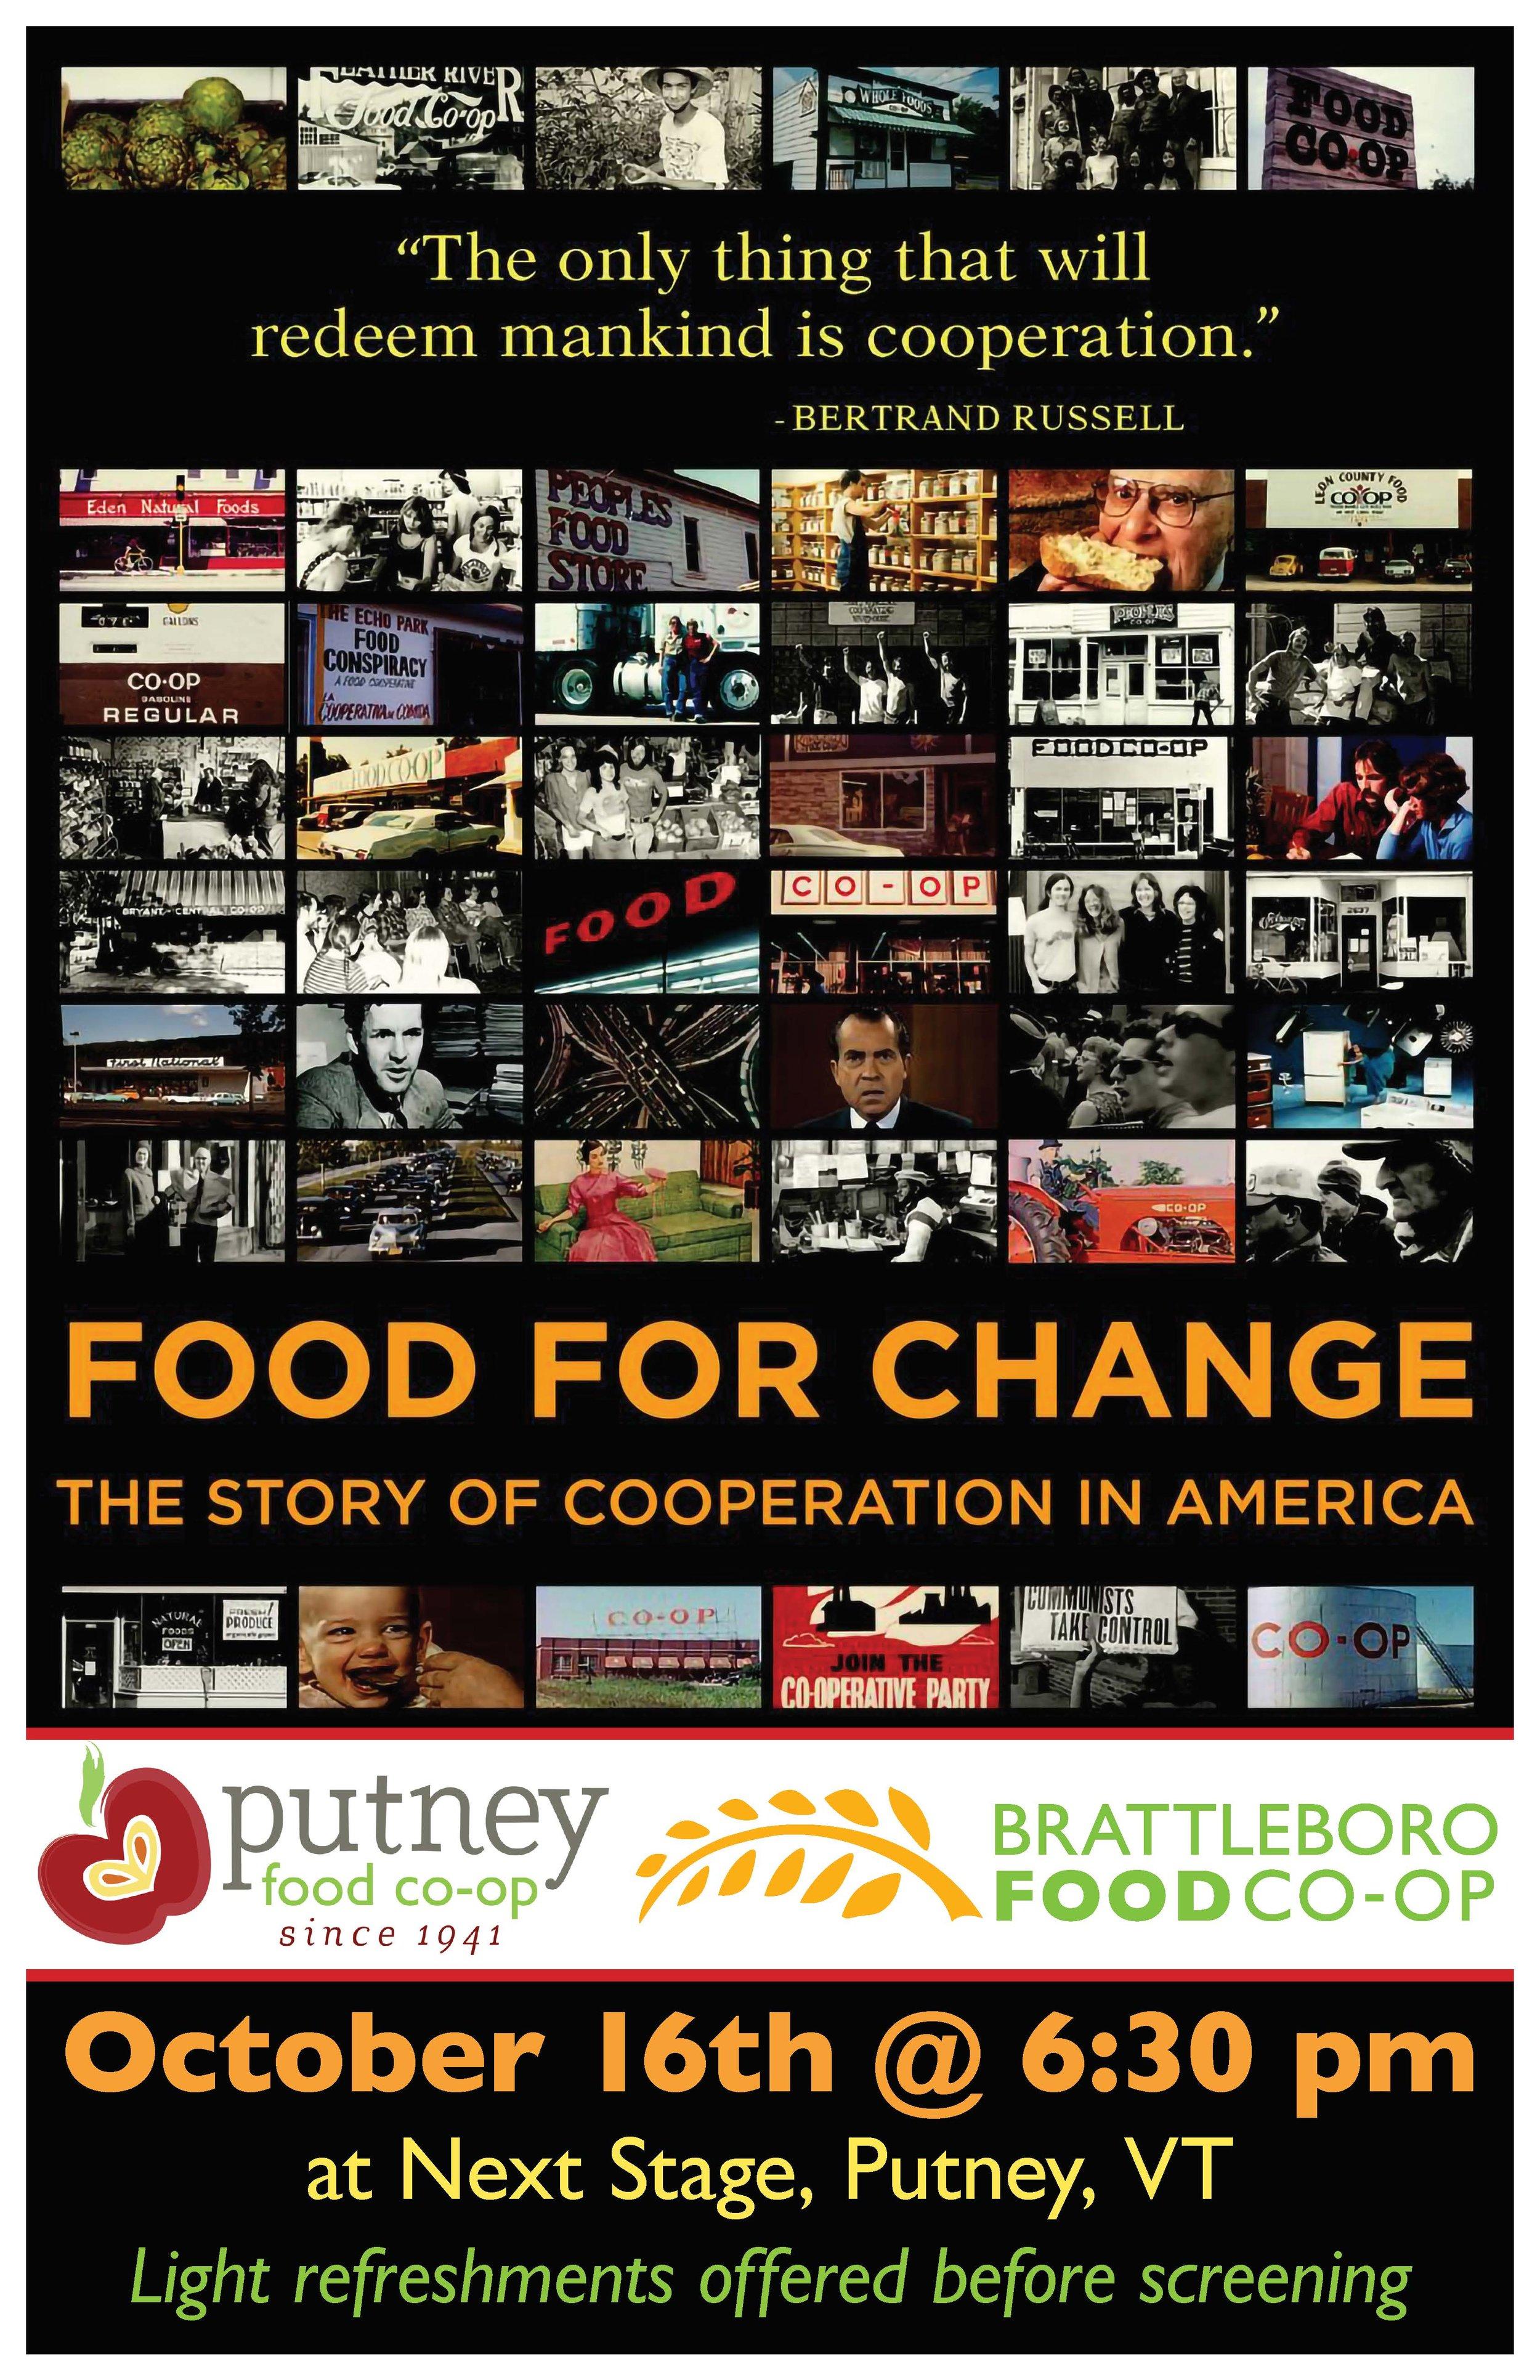 FoodForChangeFilm.jpg